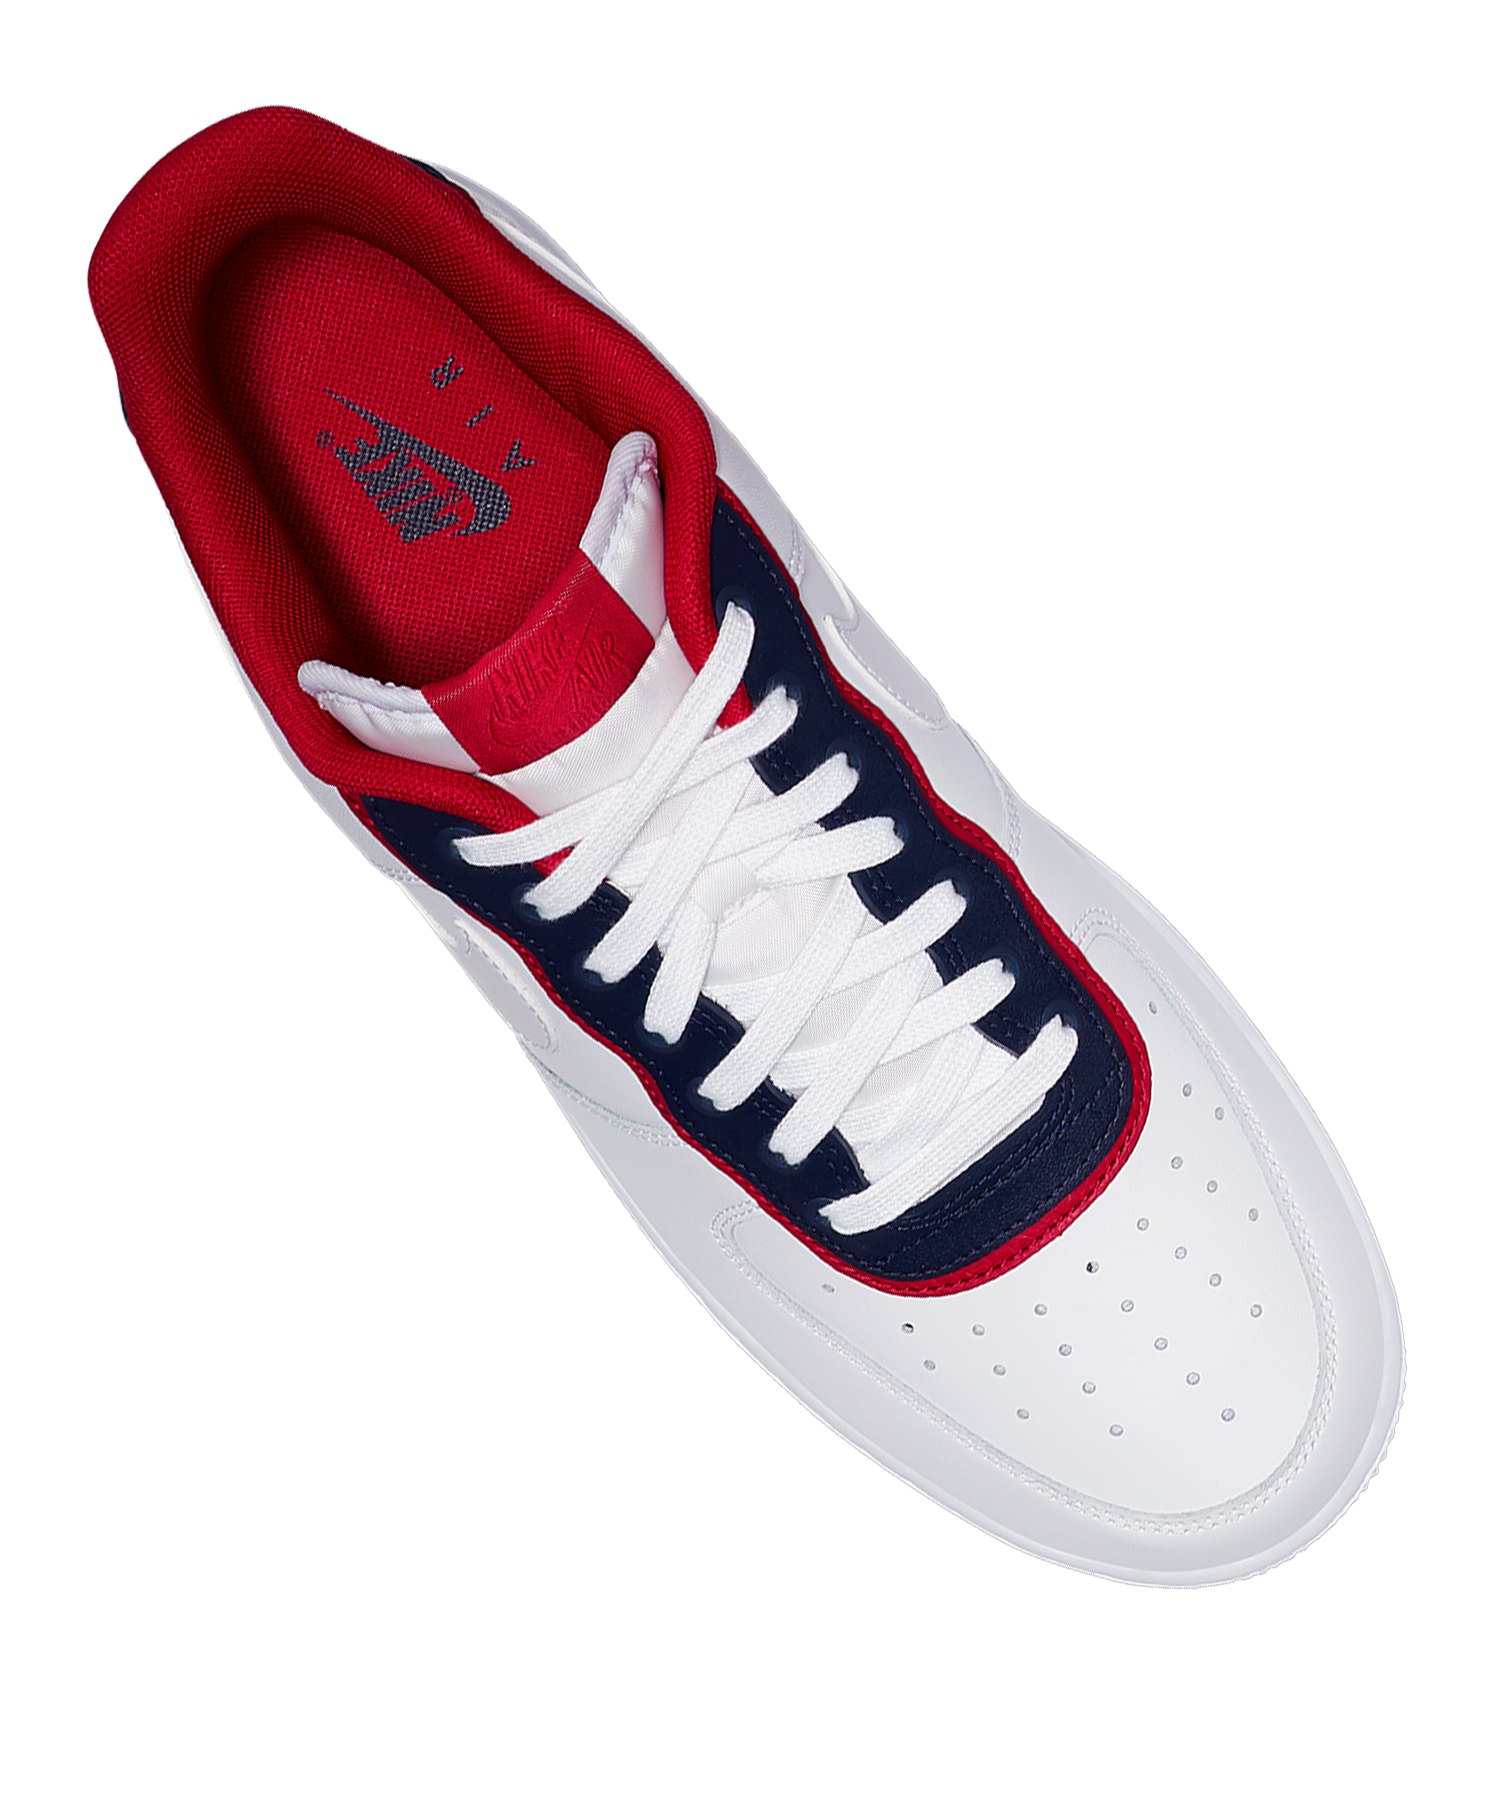 Air Blau 07 F100 1 Sneaker Nike Force Lv8 Weiss D9IE2WYH